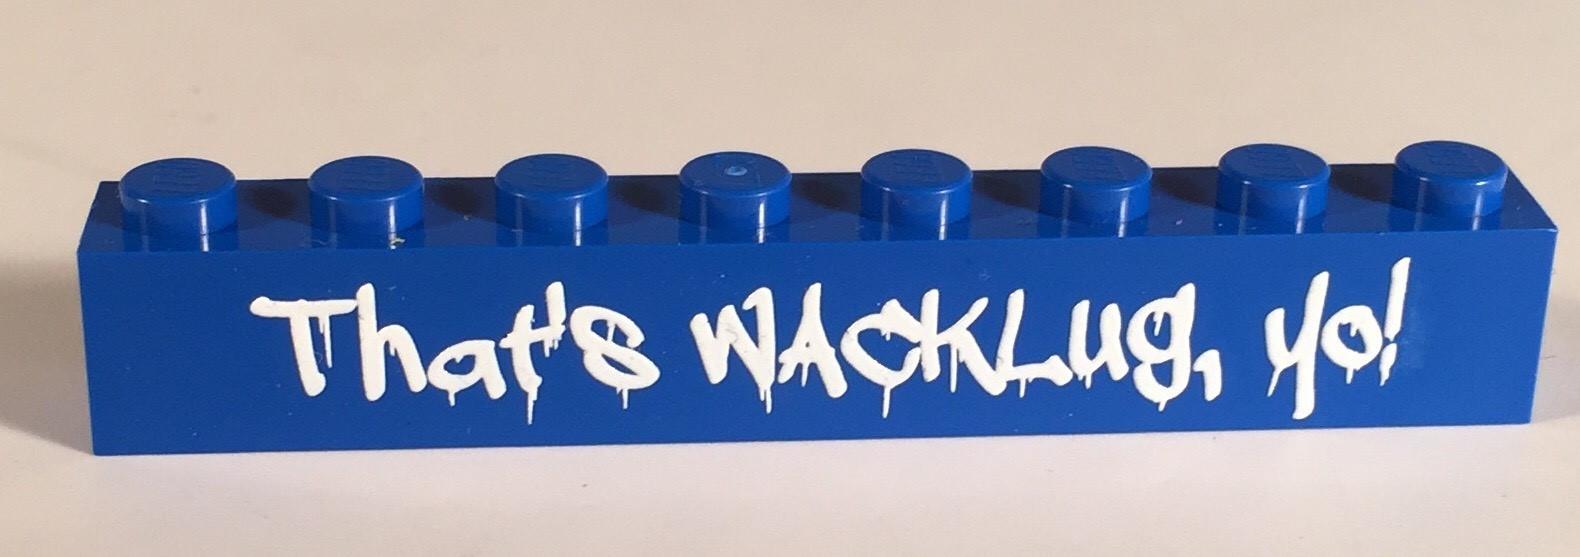 zach clapsadle wacklug printed brick.jpg